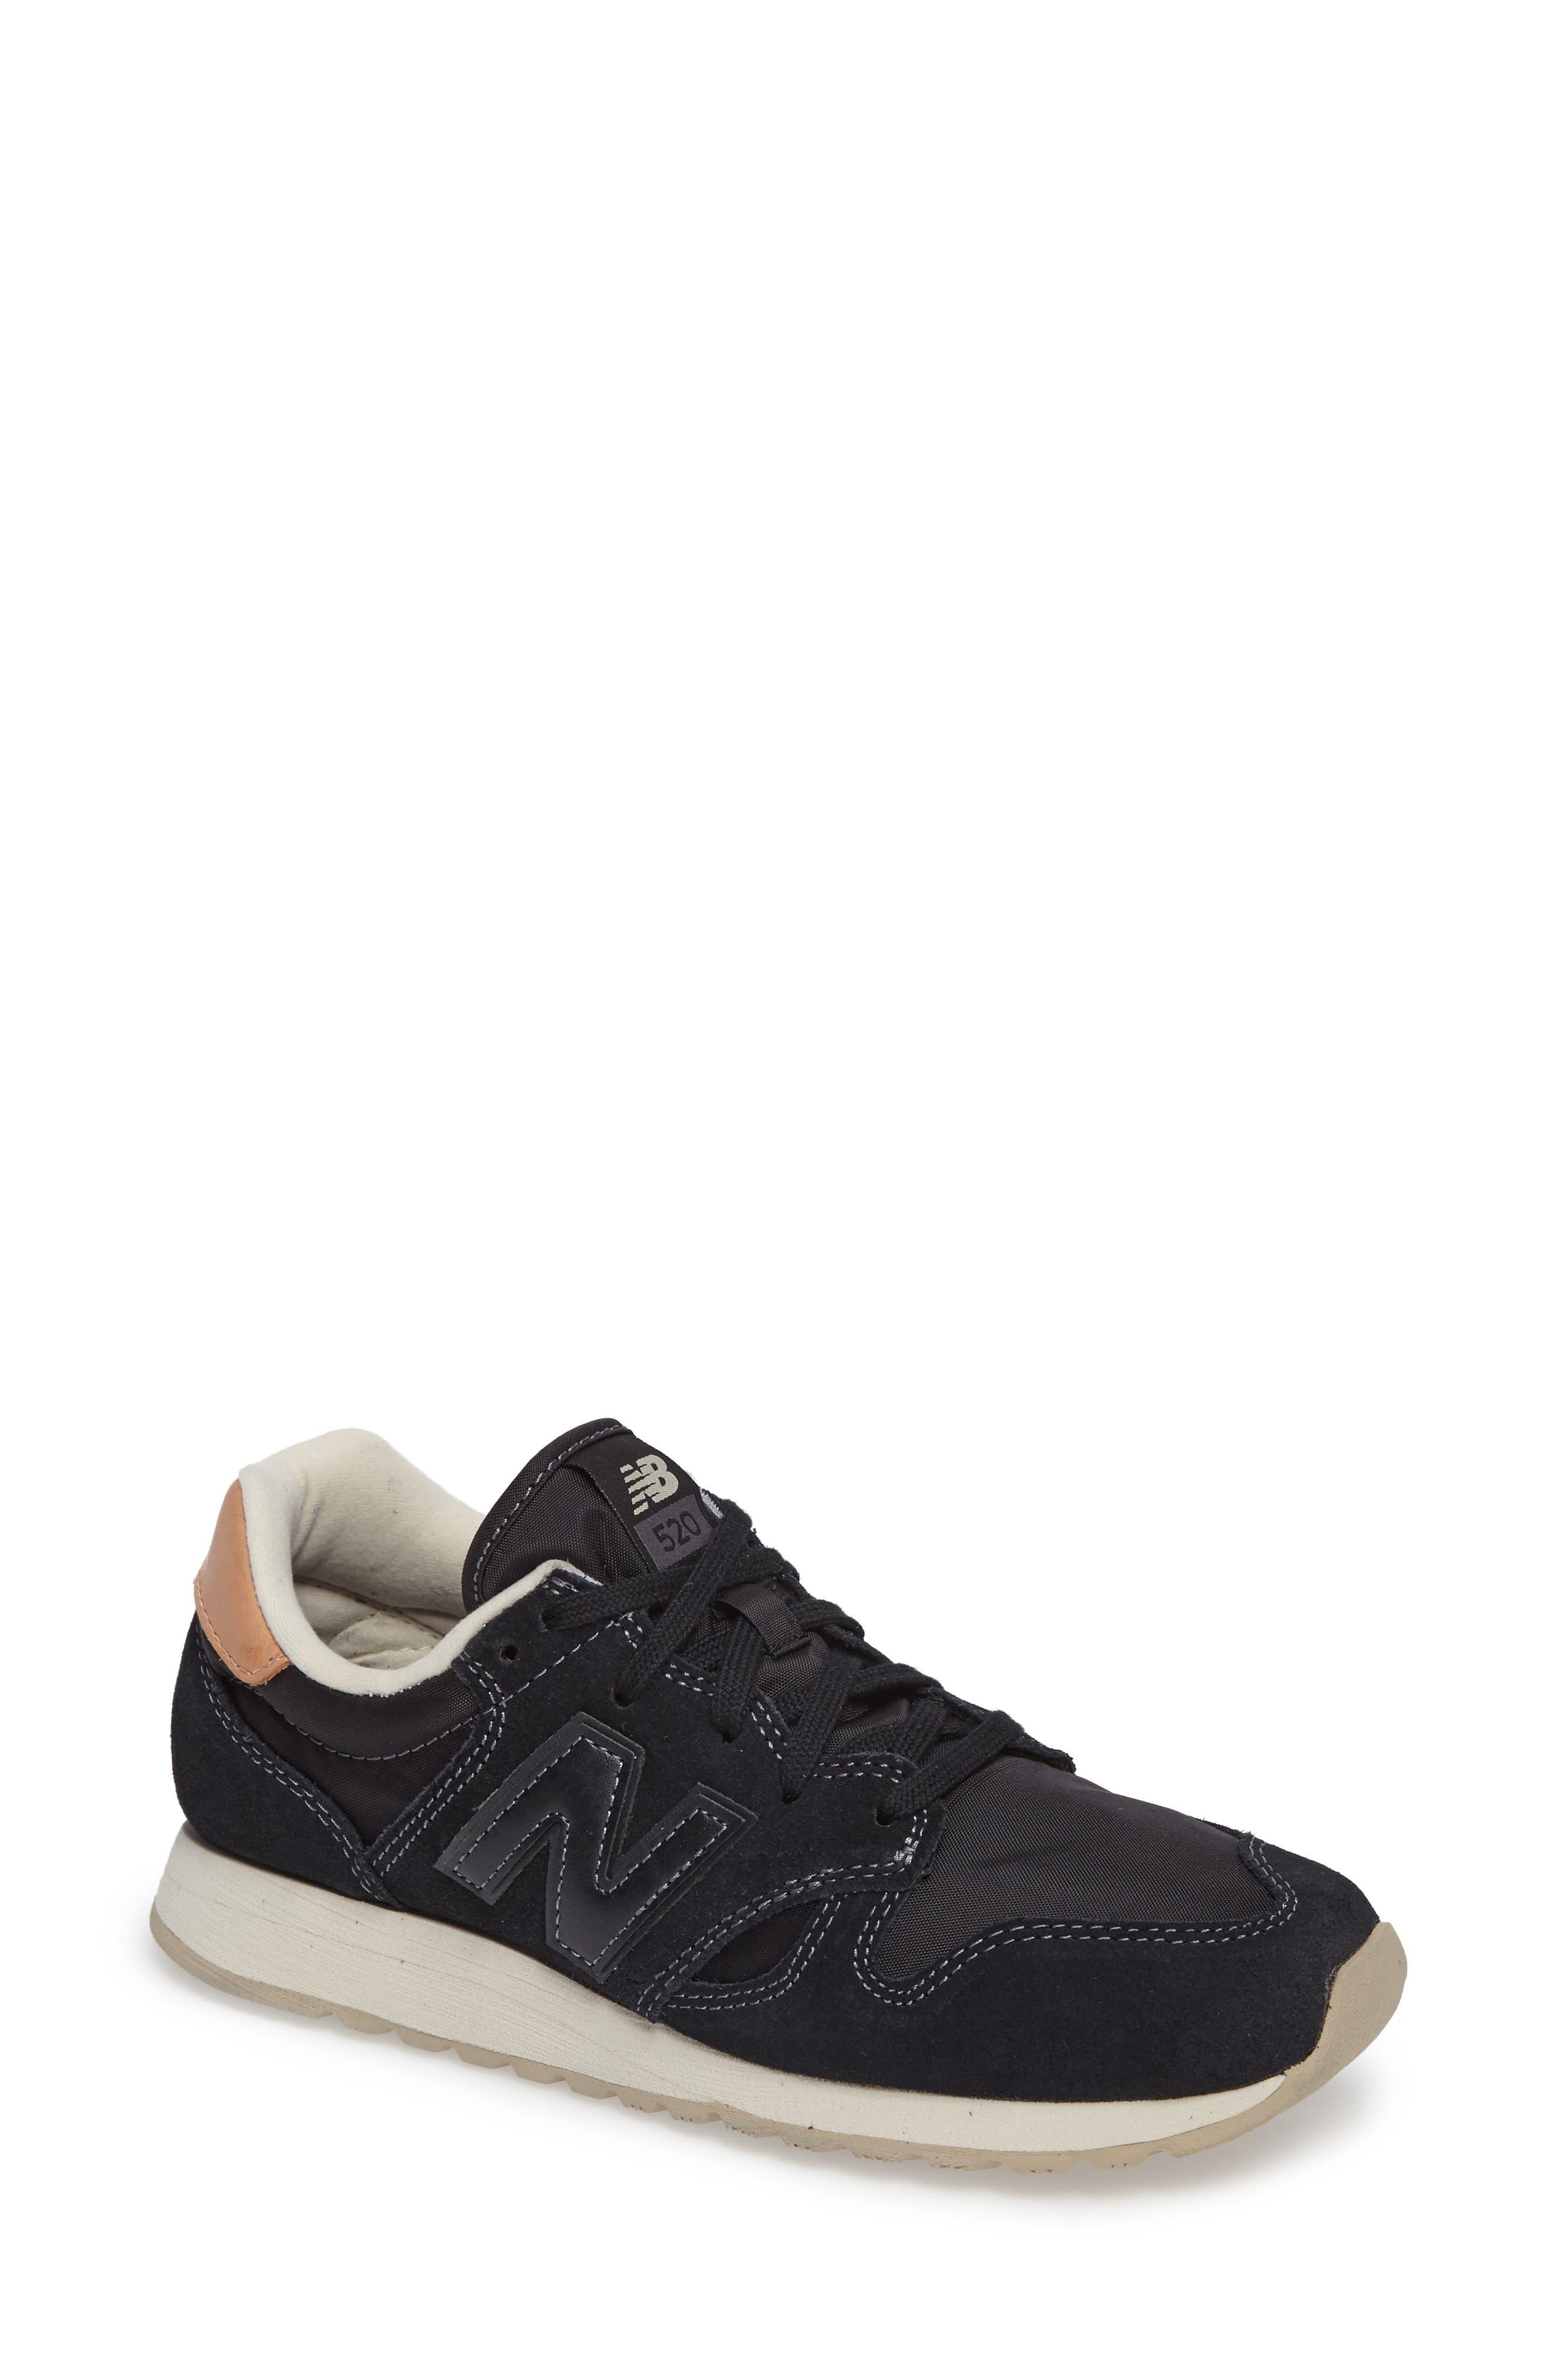 Alternate Image 1 Selected - New Balance 520 Sneaker (Women)